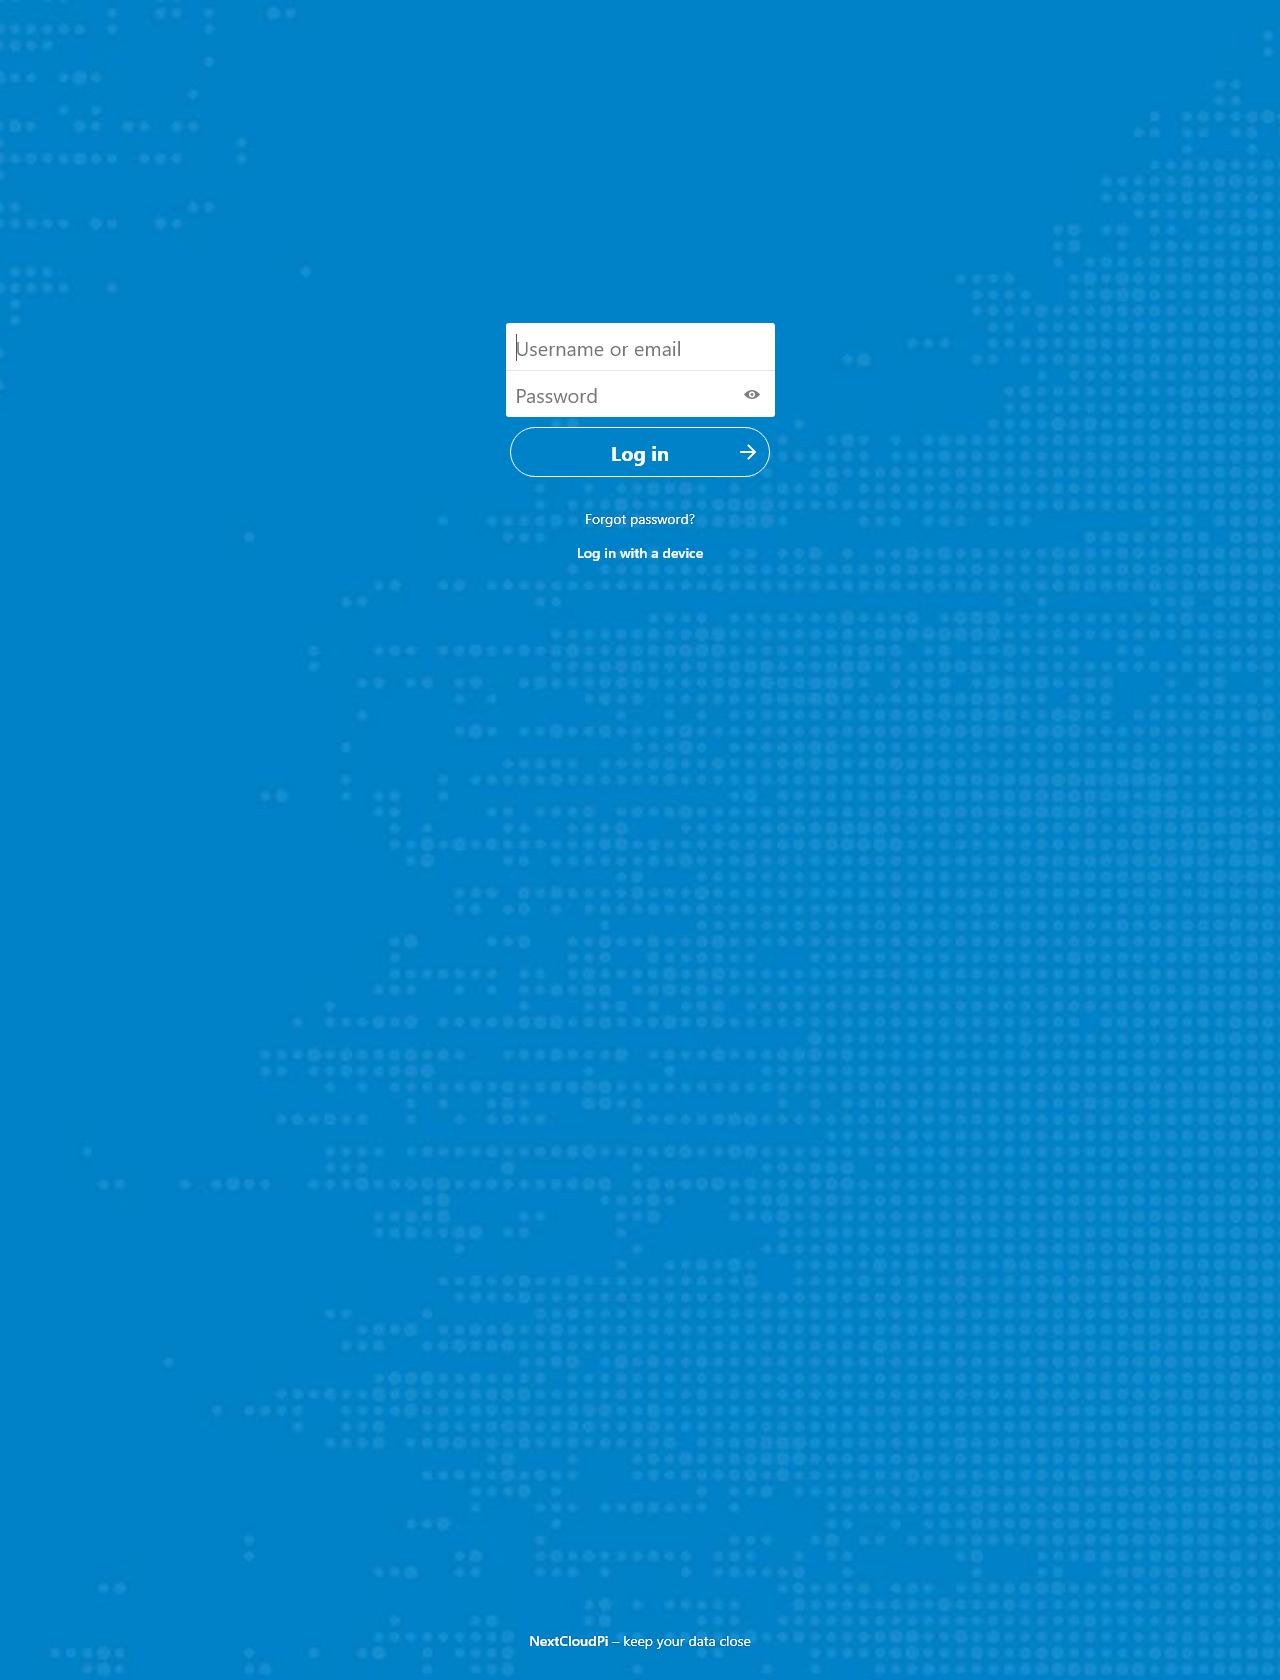 Screenshot Desktop - https://0185dmj4711.goip.de/index.php/login